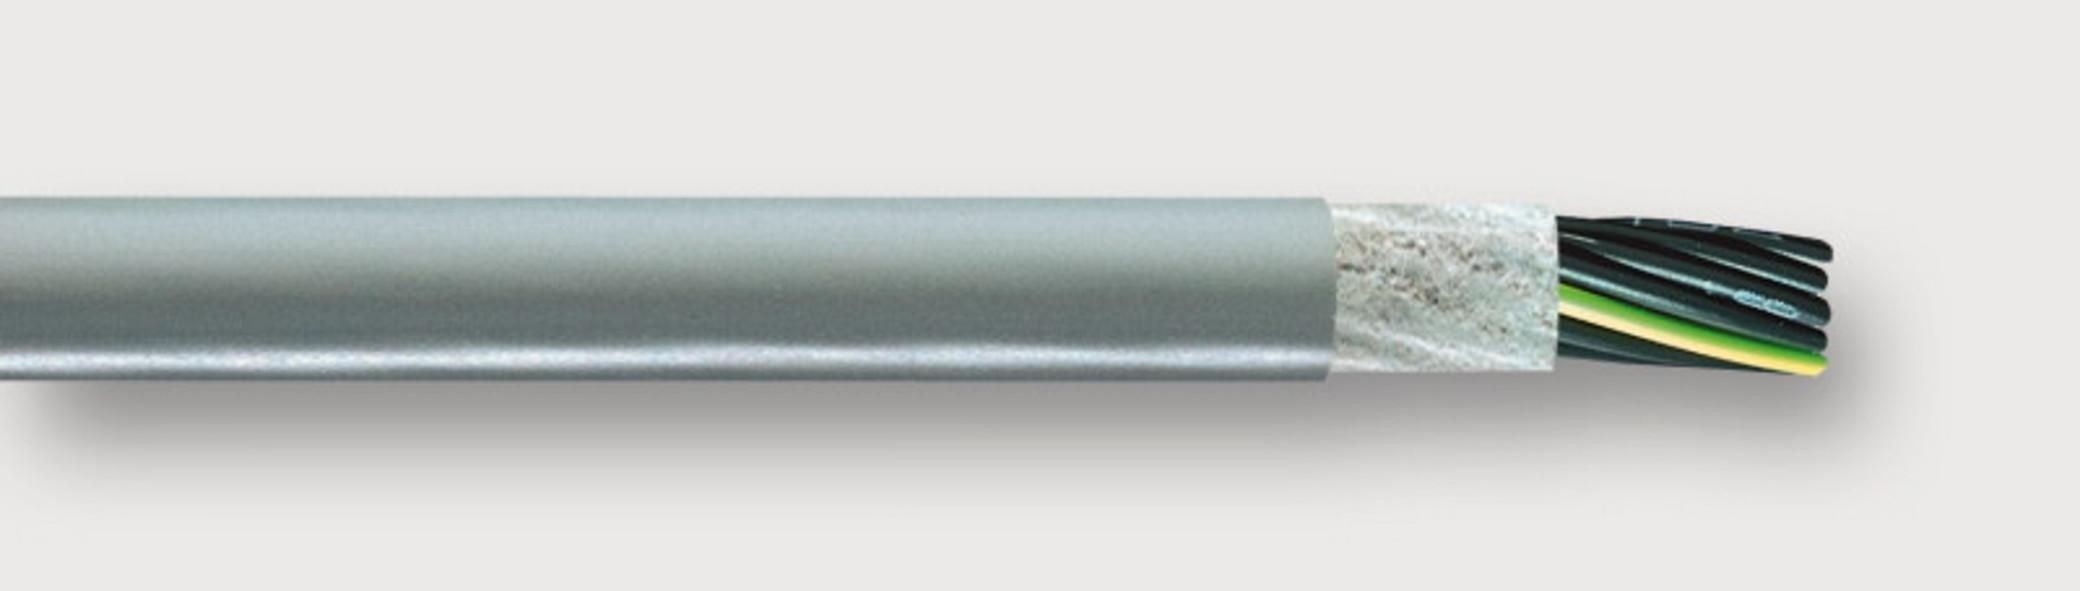 Edess/ö 102014012 A=14//B=35//GL 90-C=12 HW Z2+1 S12 mm Straight router bit